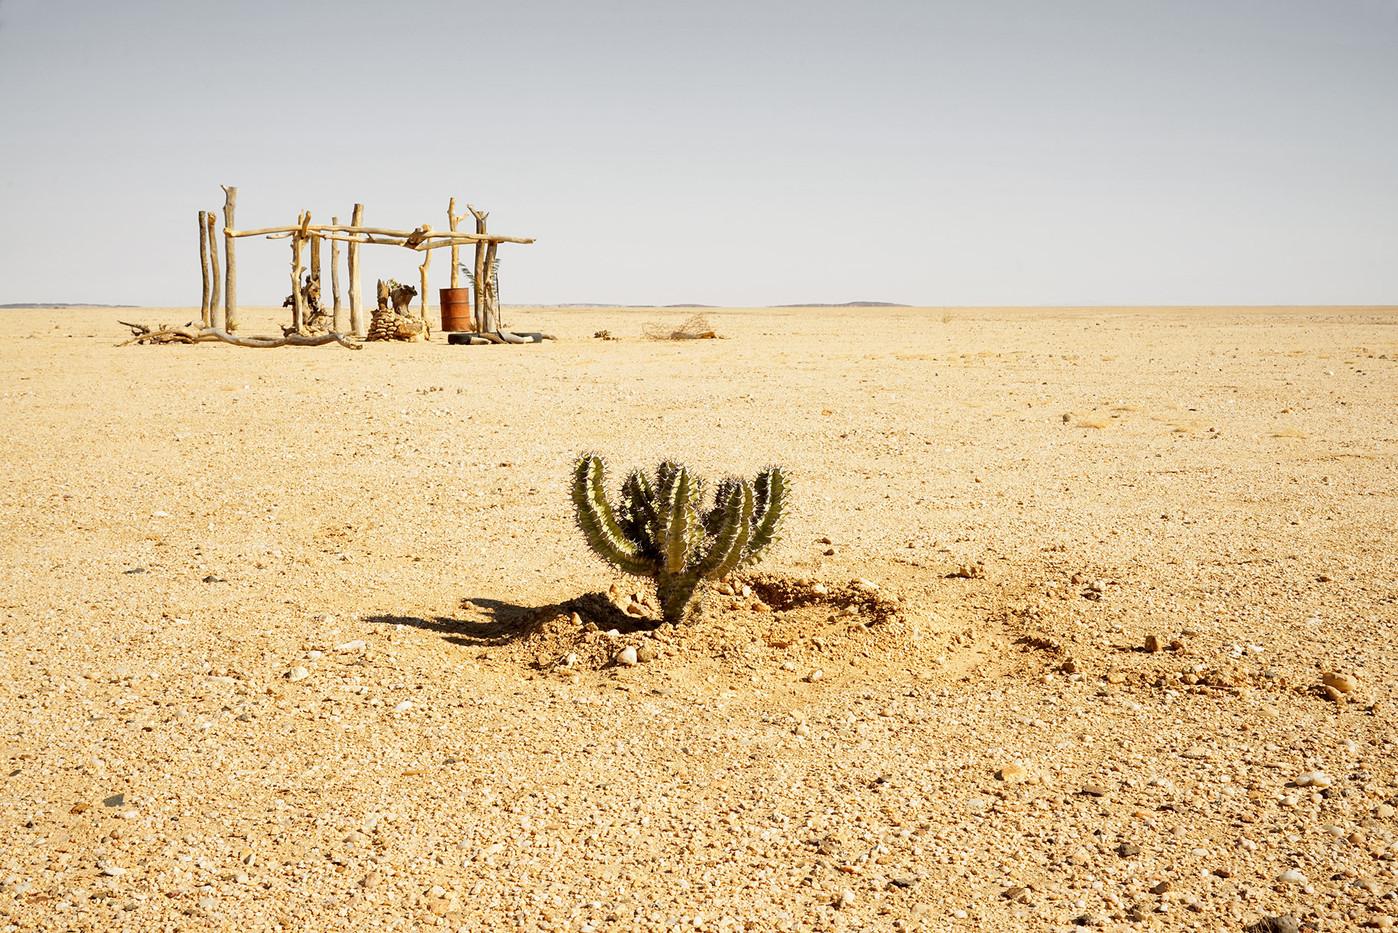 "Margaret Courtney-Clarke | ""Poison Tree"" (Euphorbia Virosa), D1918, Erongo Region, Namibia, July, 2018 | 2018 | Giclée Print on Hahnemühle PhotoRag | 34 x 50.5 cm | Edition of 6 + 2 AP"